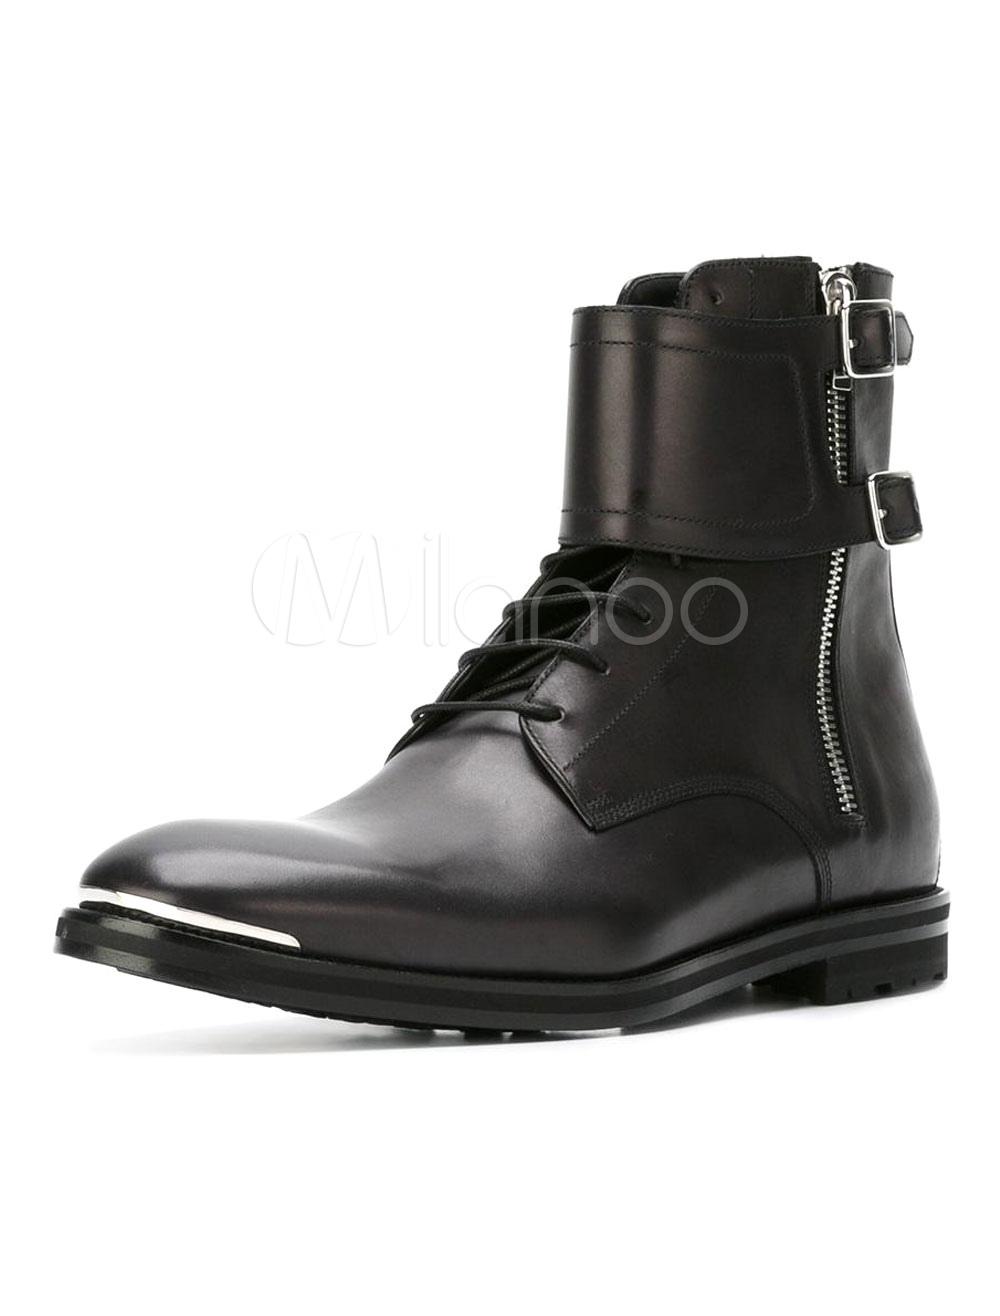 Black Martin Boots Cowhide Metallic Buckled Round Toe Zipper Men's High Top Boots